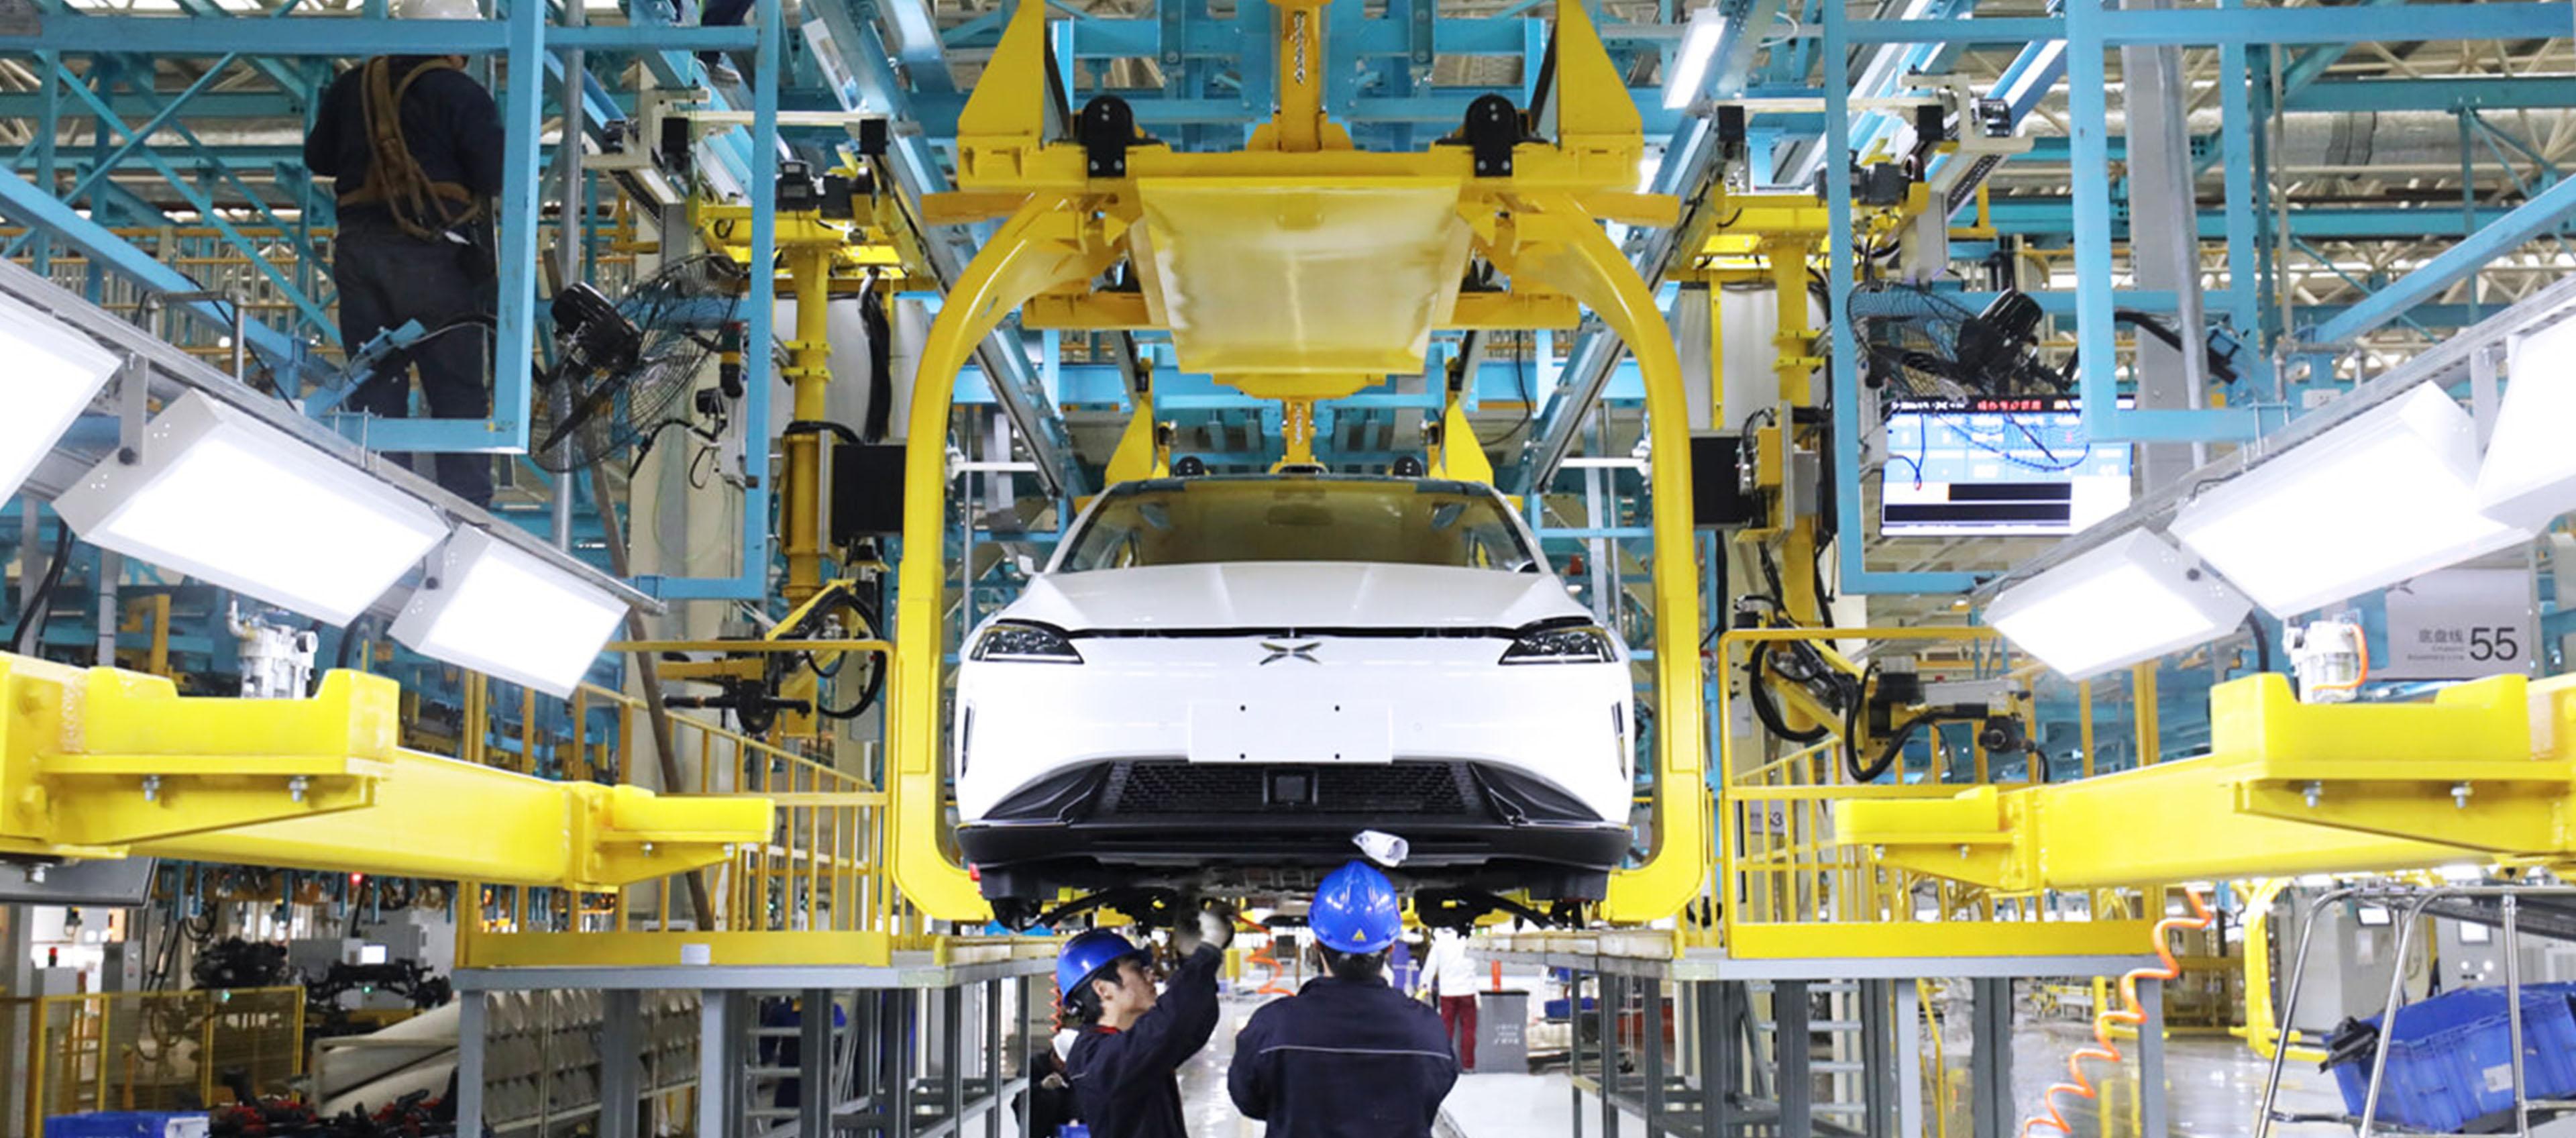 Chinese EV startups feel the heat as Tesla slashes prices, market subsidies ending